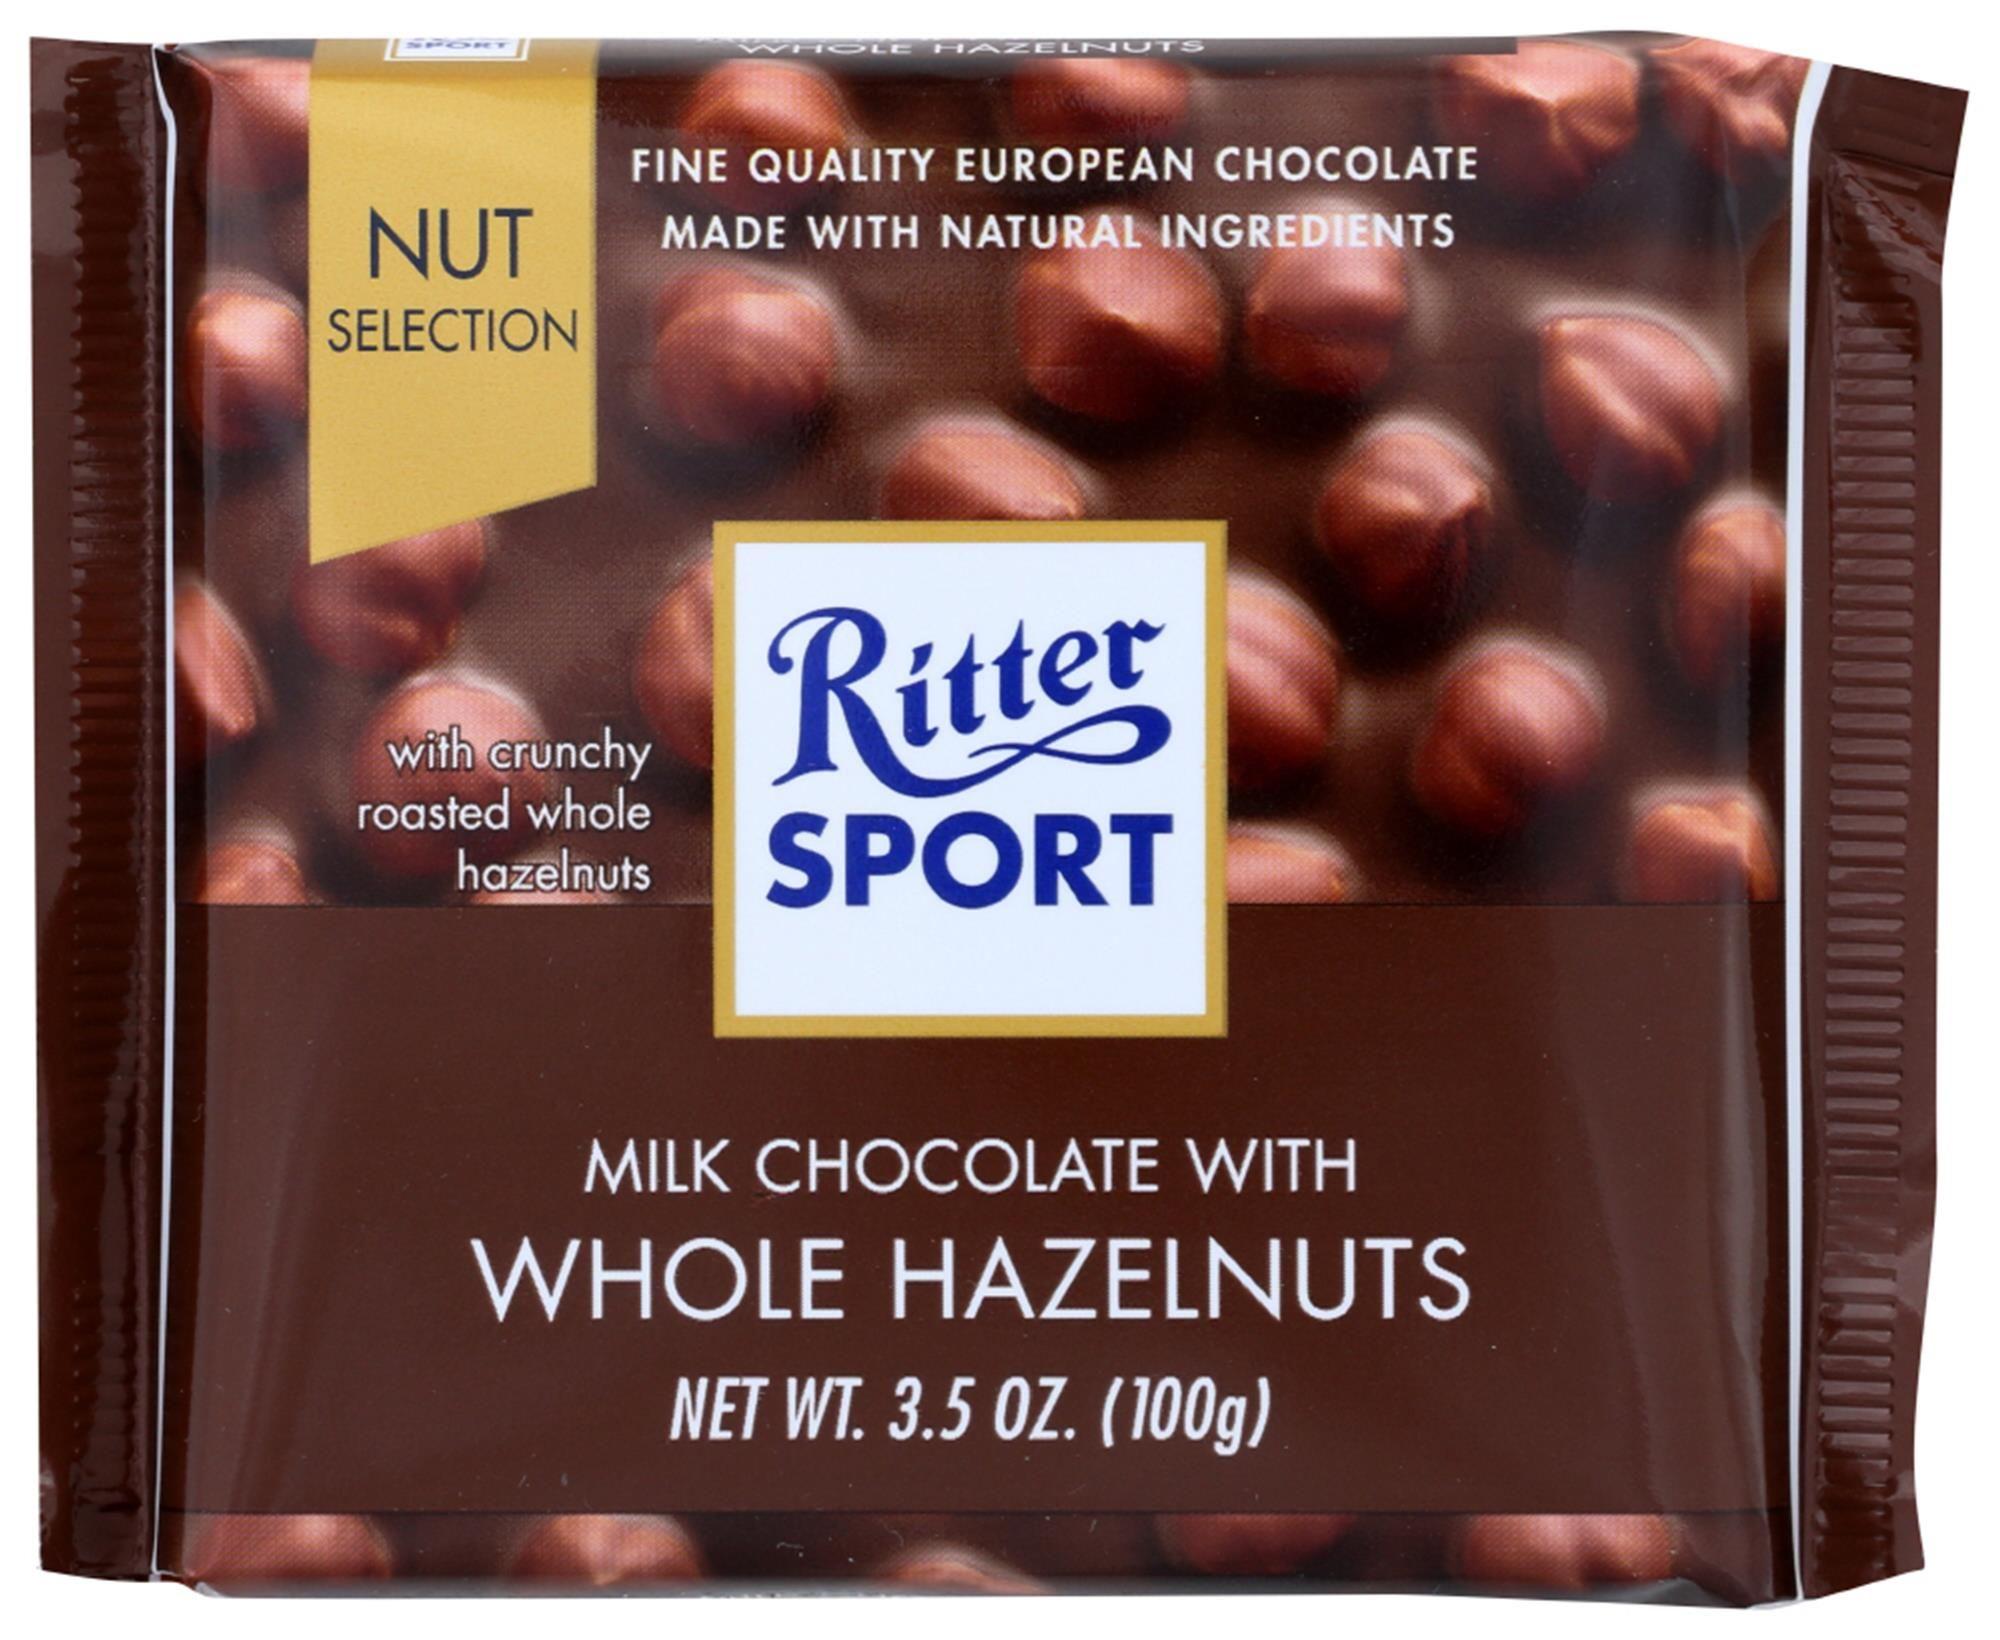 Ritter Sport Chocolate, Milk With Whole Hazelnuts, 3.5 Oz